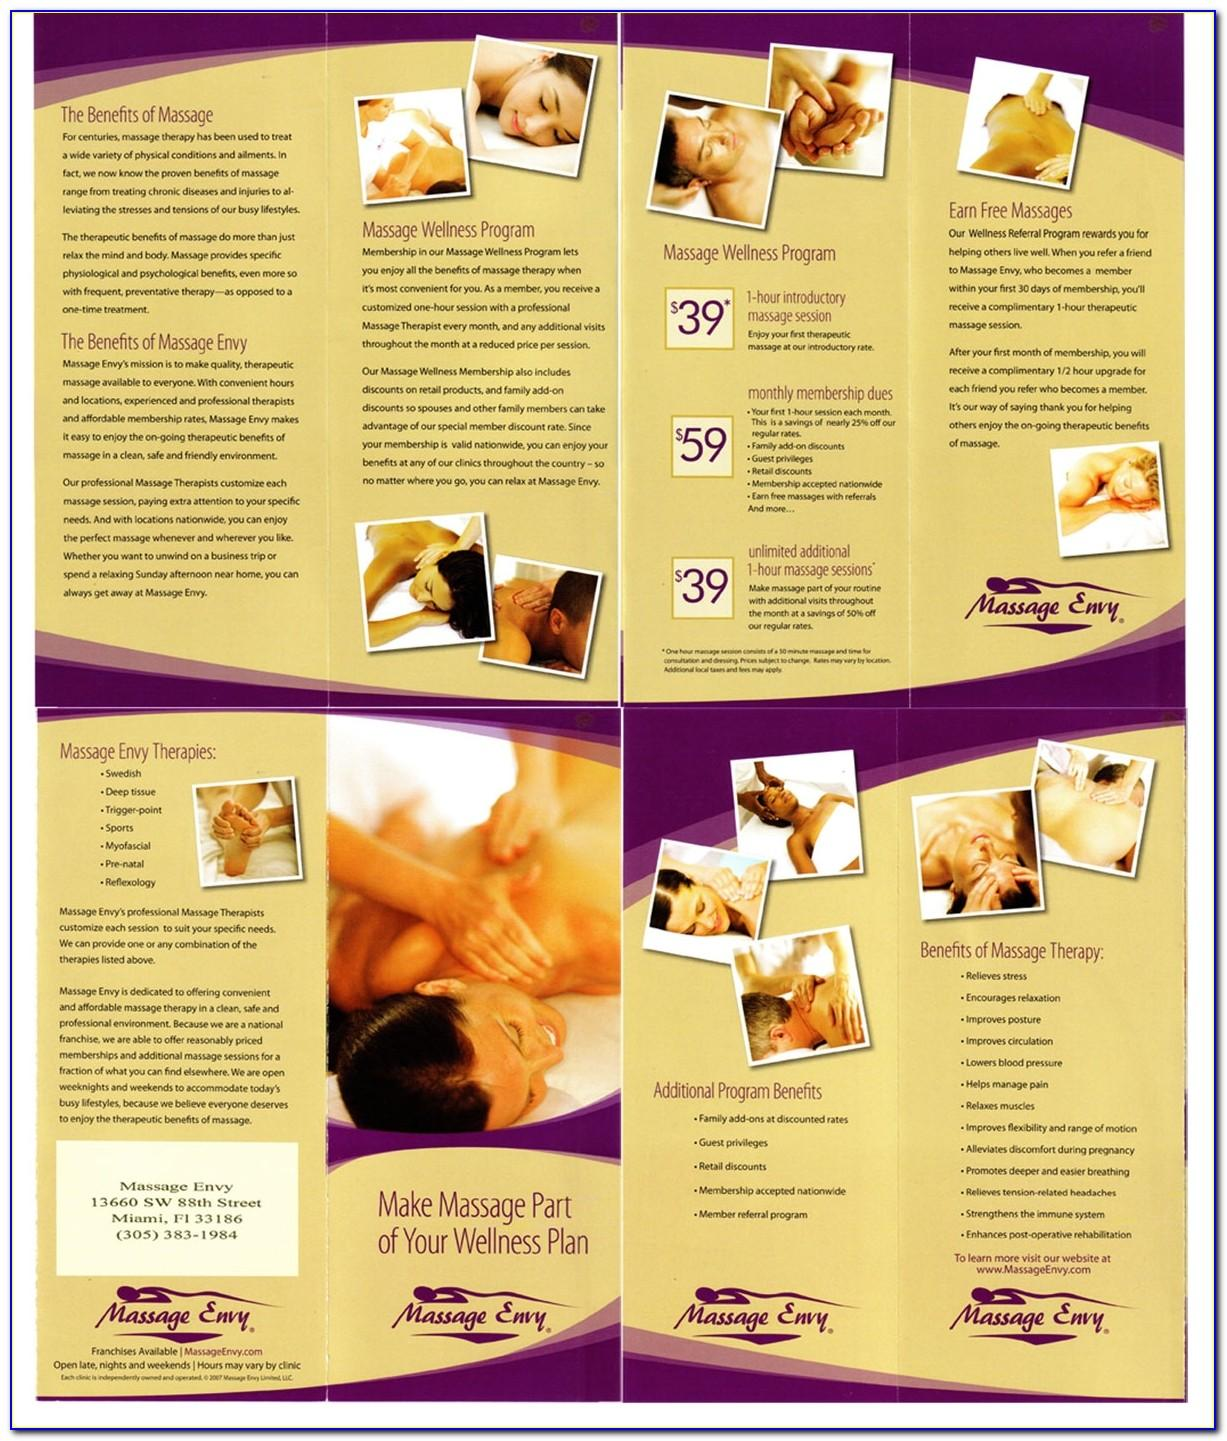 Massage Envy Membership Brochure